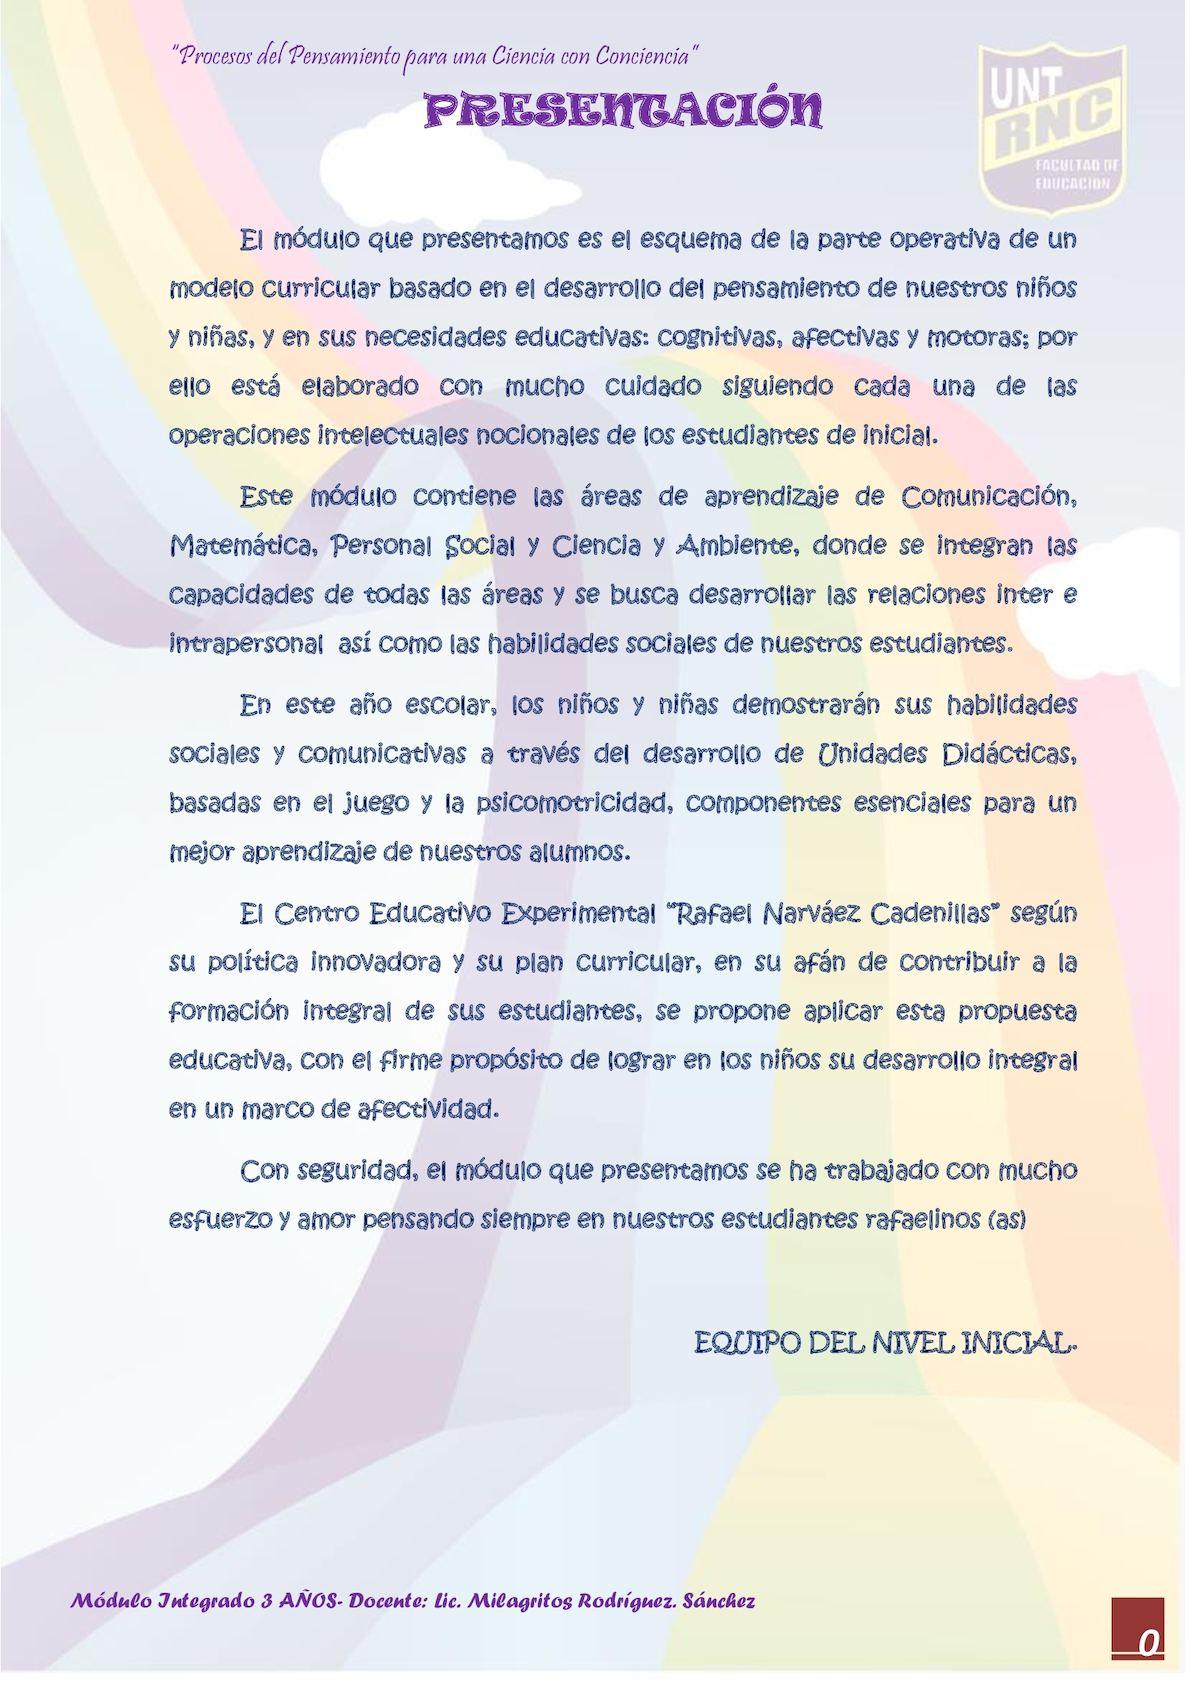 Calaméo Modulo 3 Años 2017